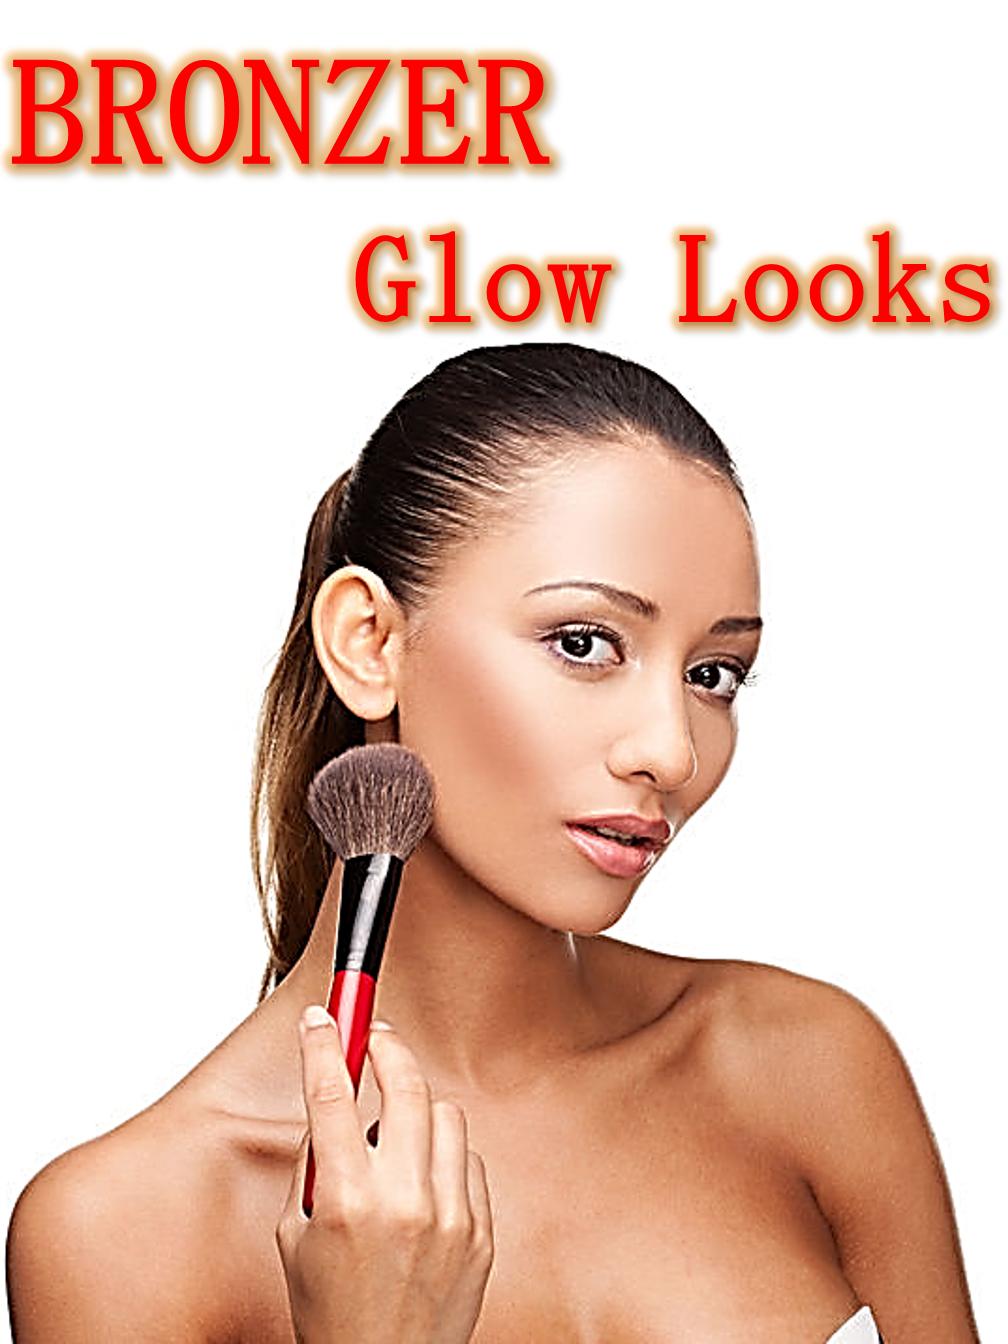 Bronzers - Glow Looks